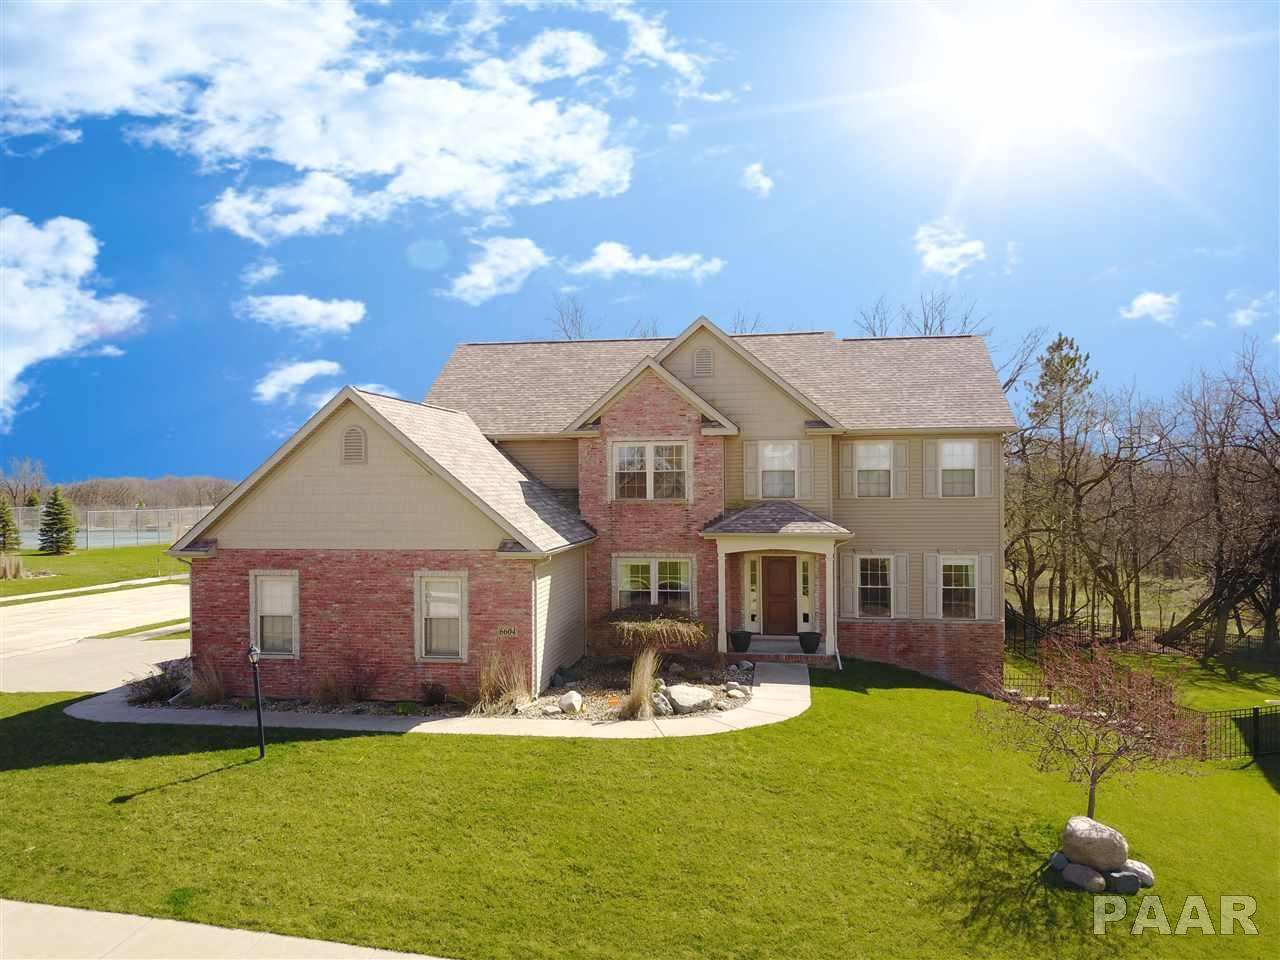 6604 W Willow Oak, Edwards, IL 61528